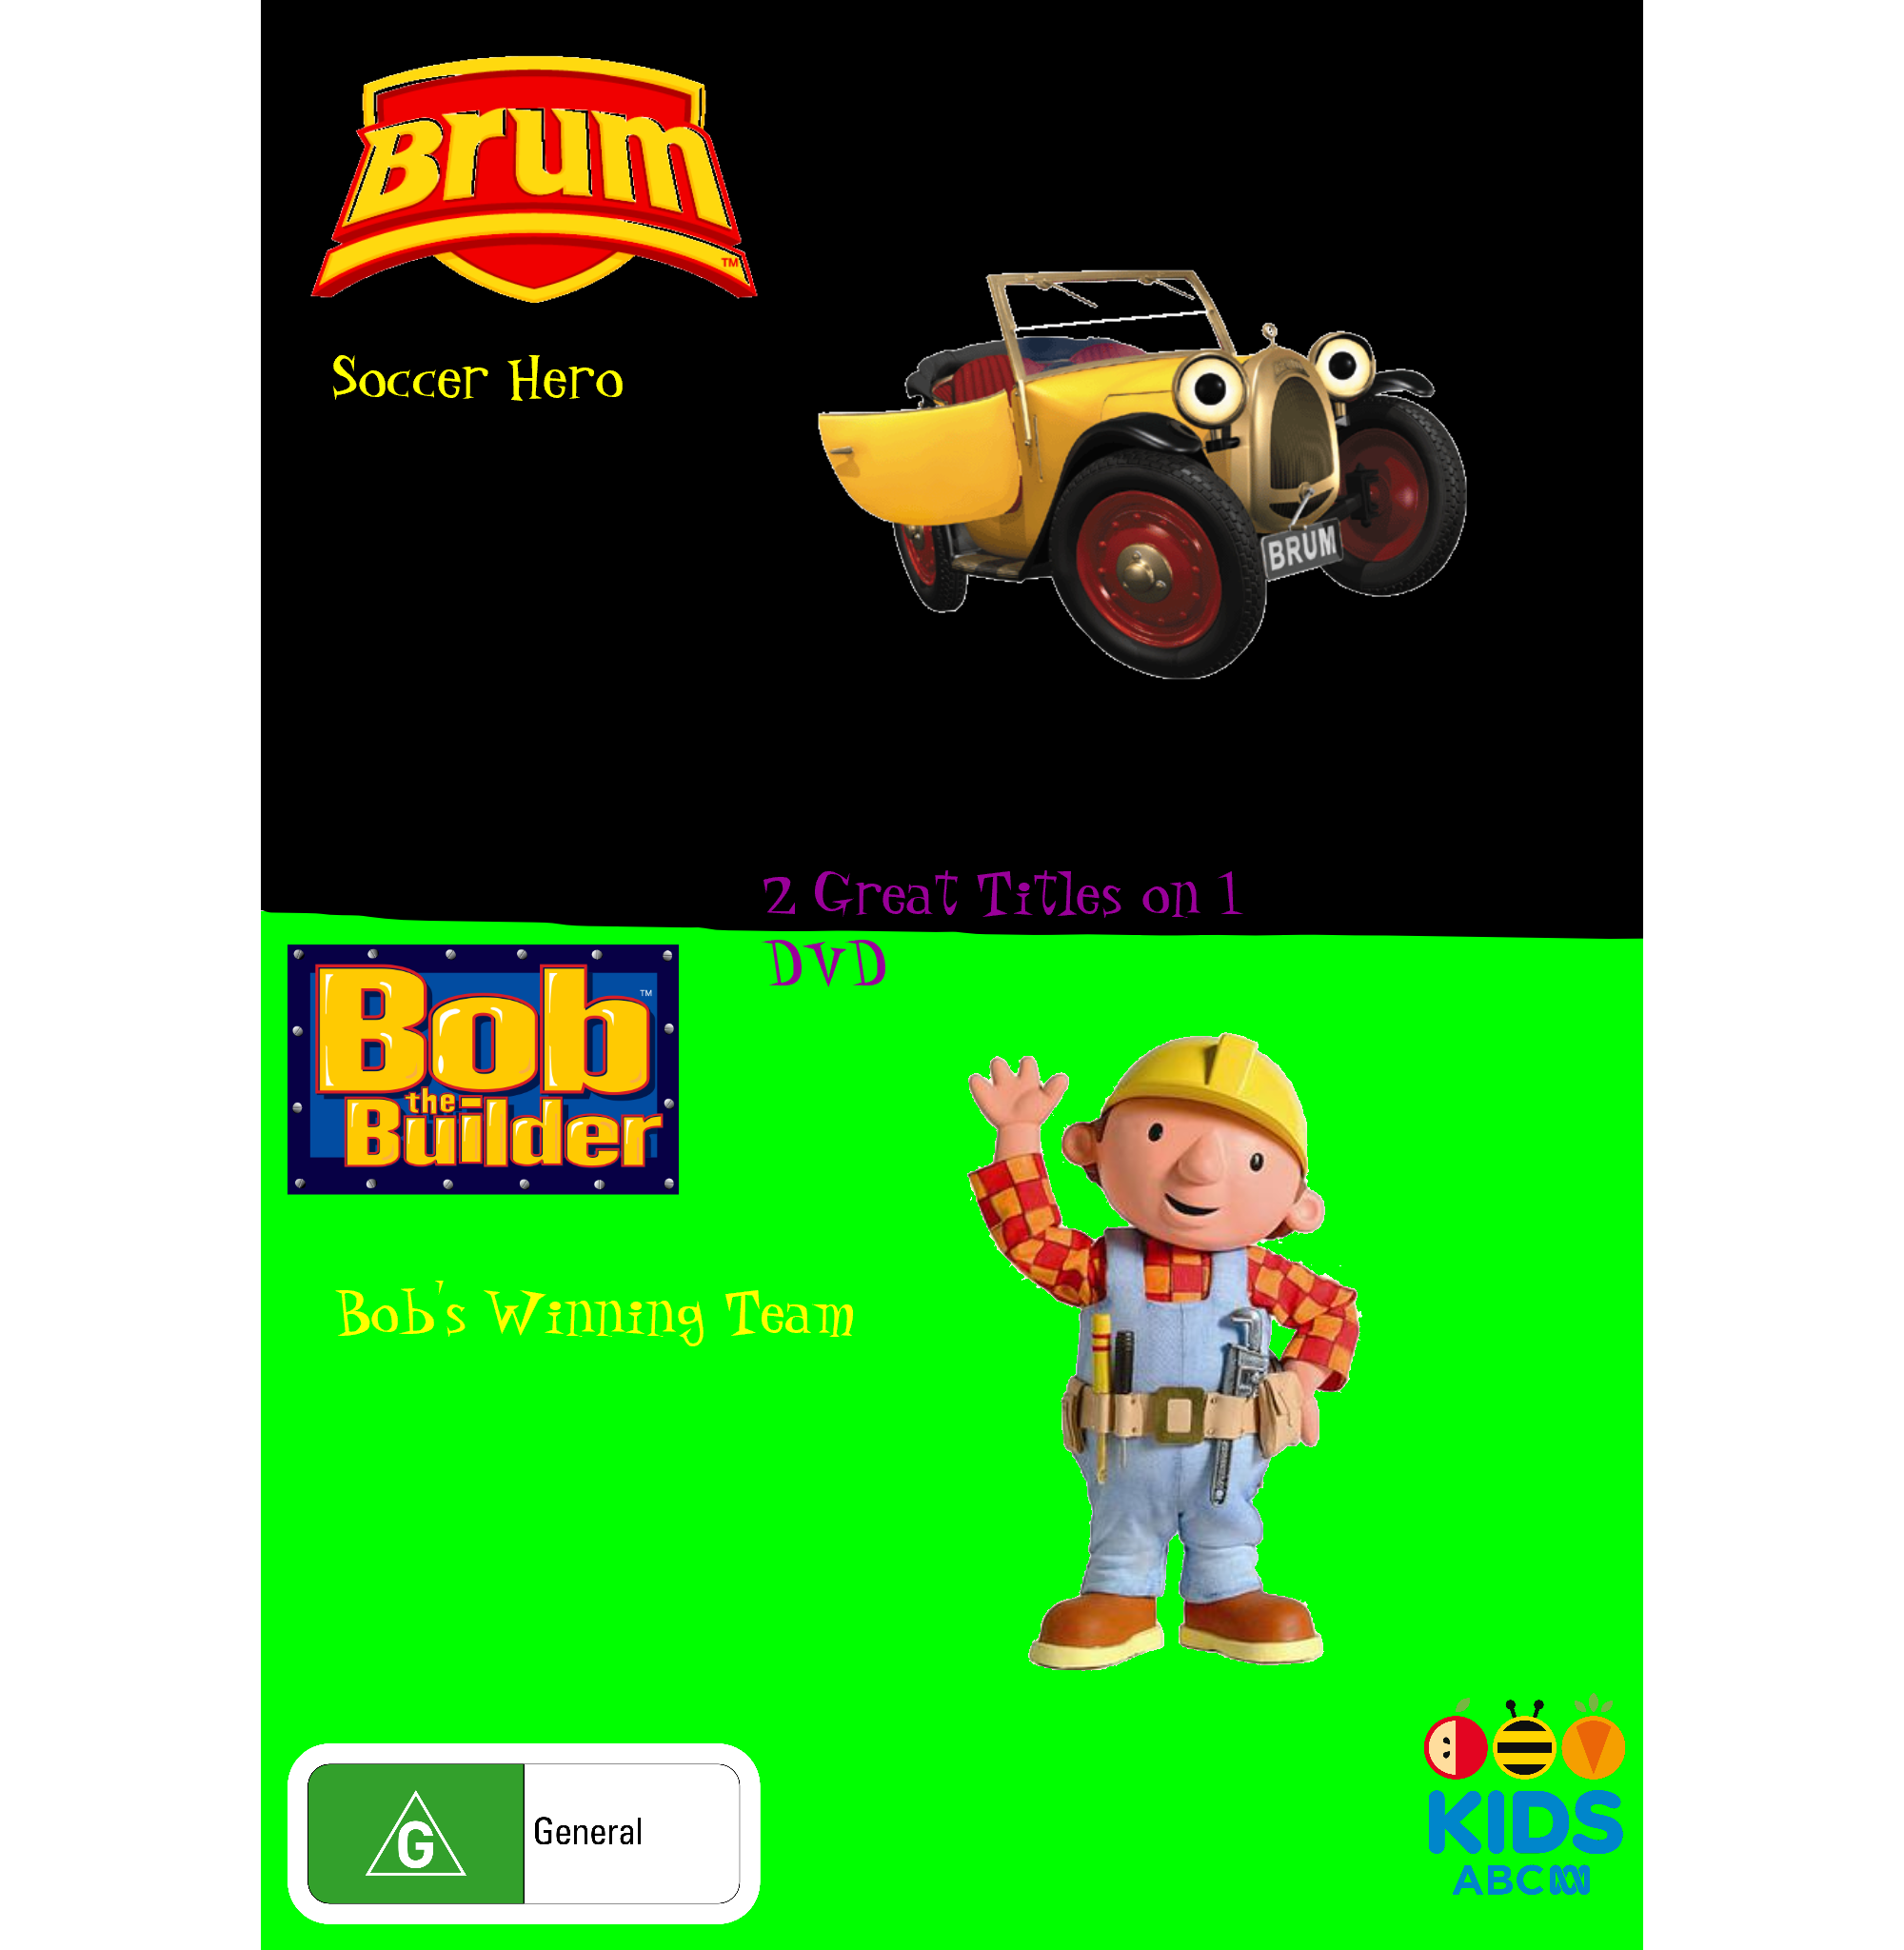 Brum and Bob the Builder: Soccer Hero and Bob's Winning Team (video)